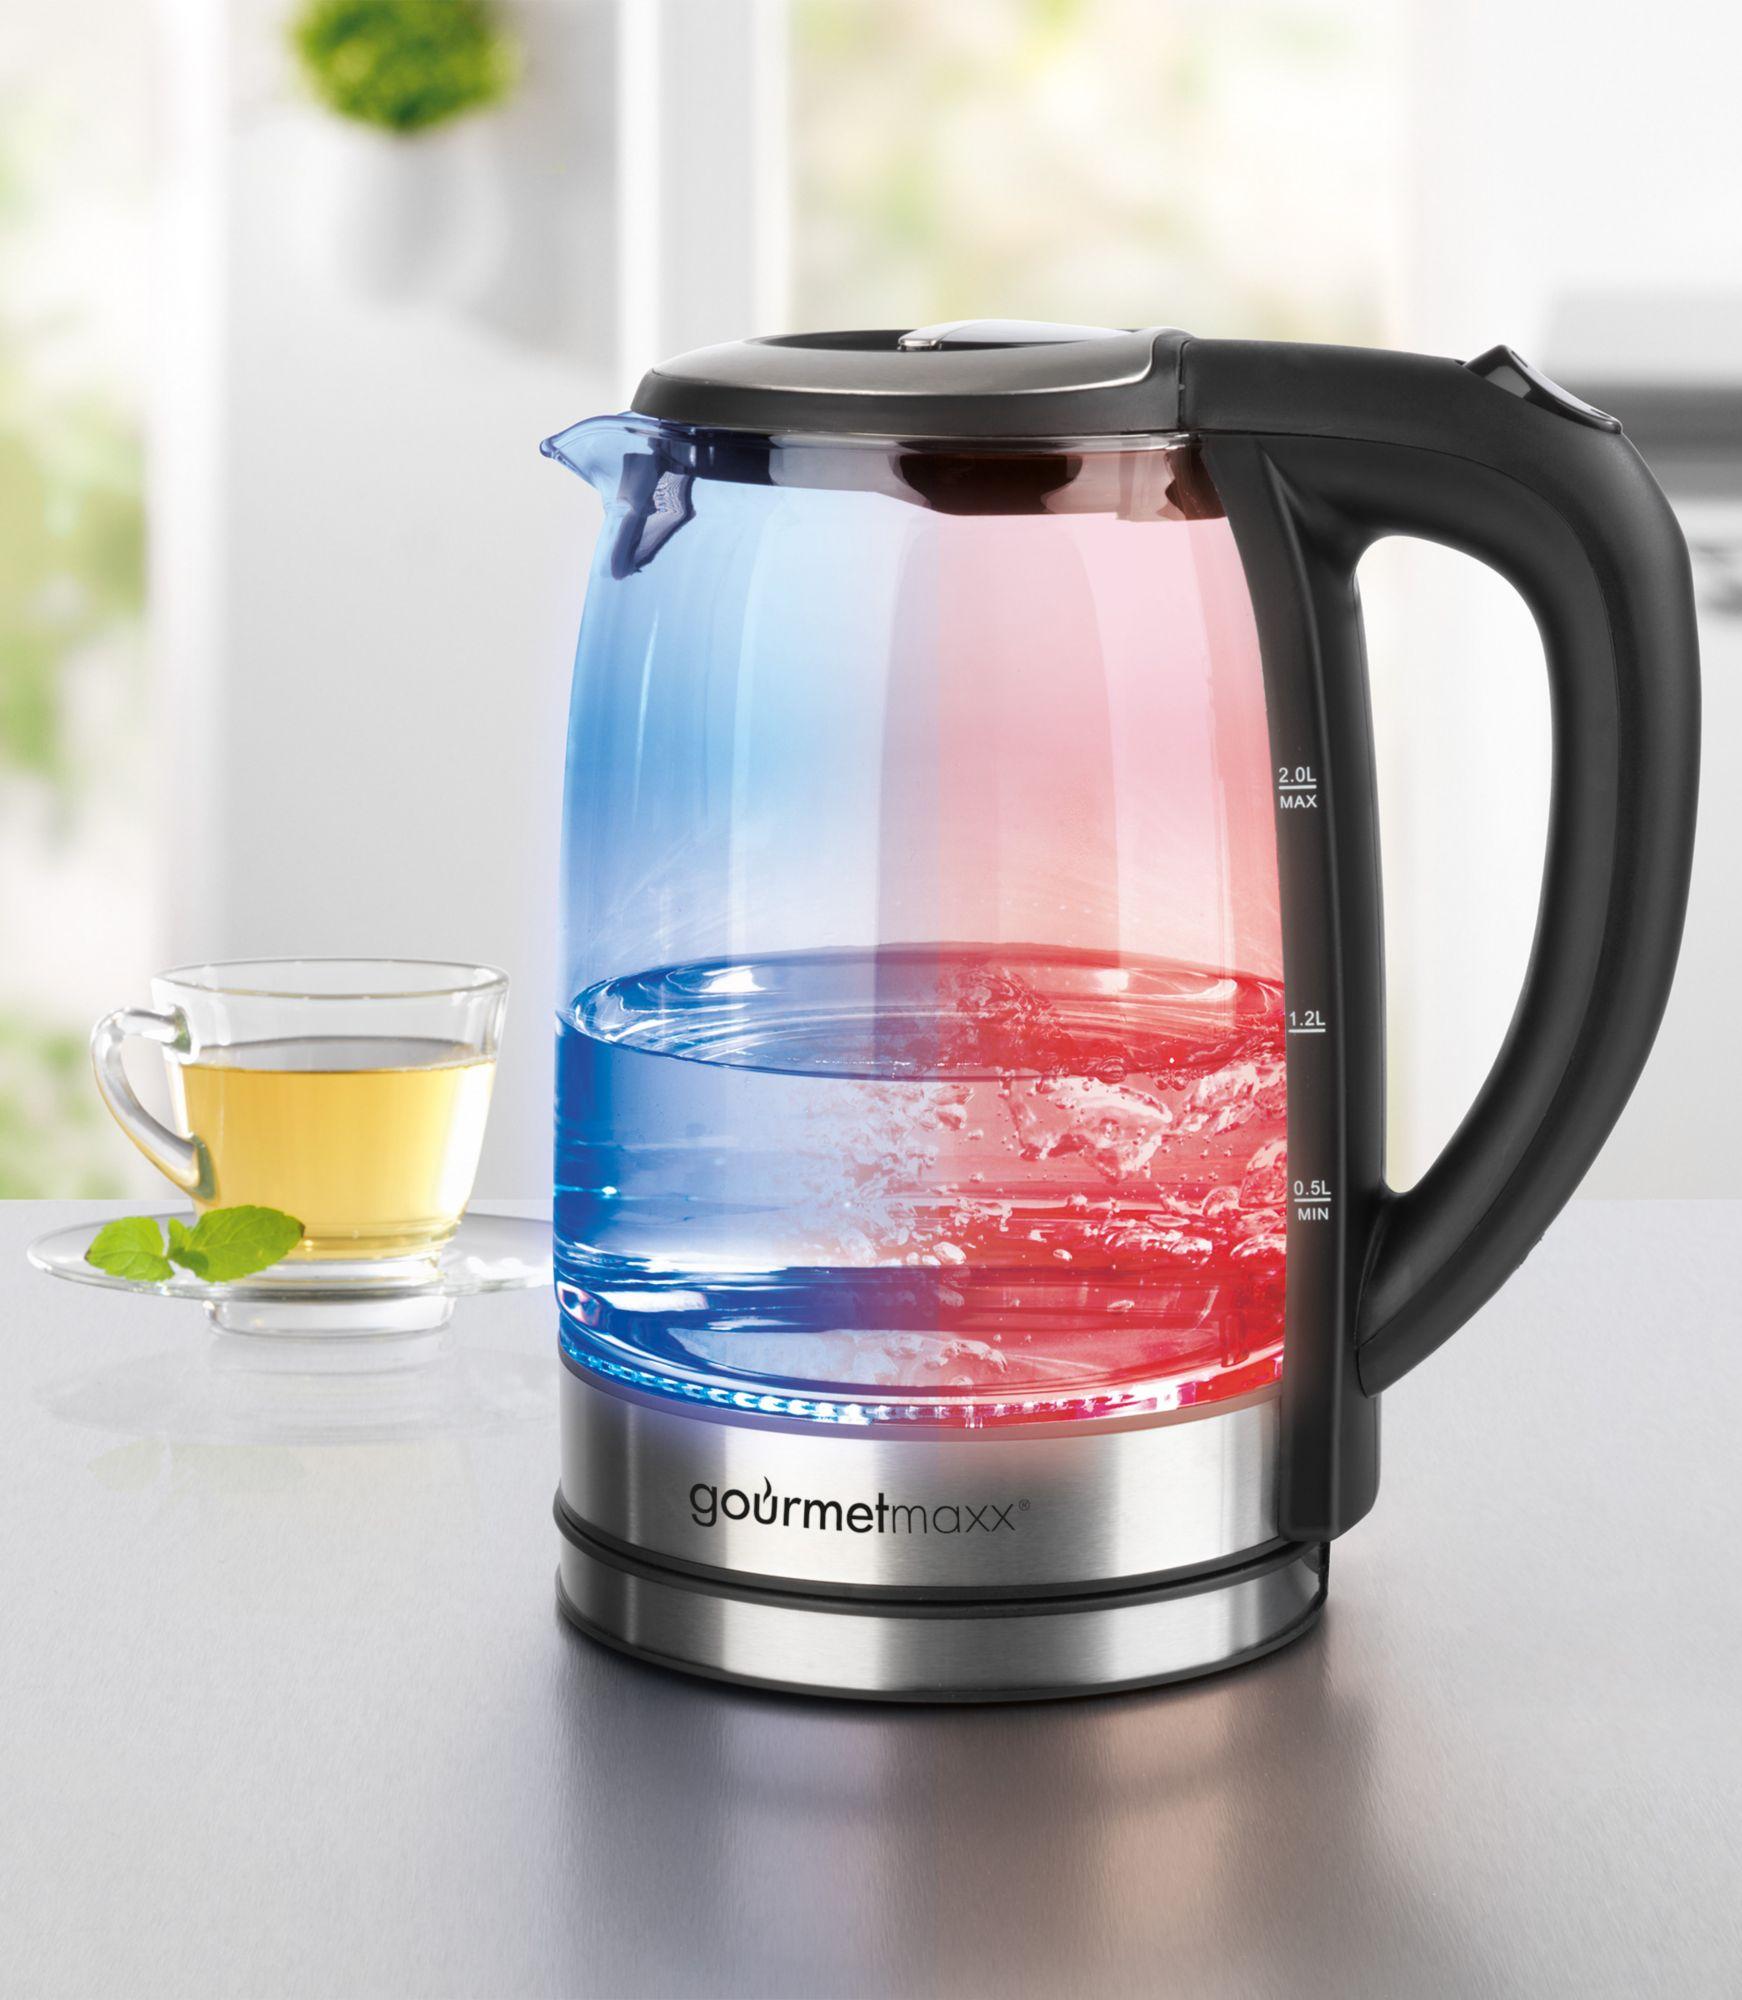 GOURMETMAXX gourmetmaxx Glas-Wasserkocher mit LED-Farbwechsel, 2 Liter, 2200 Watt